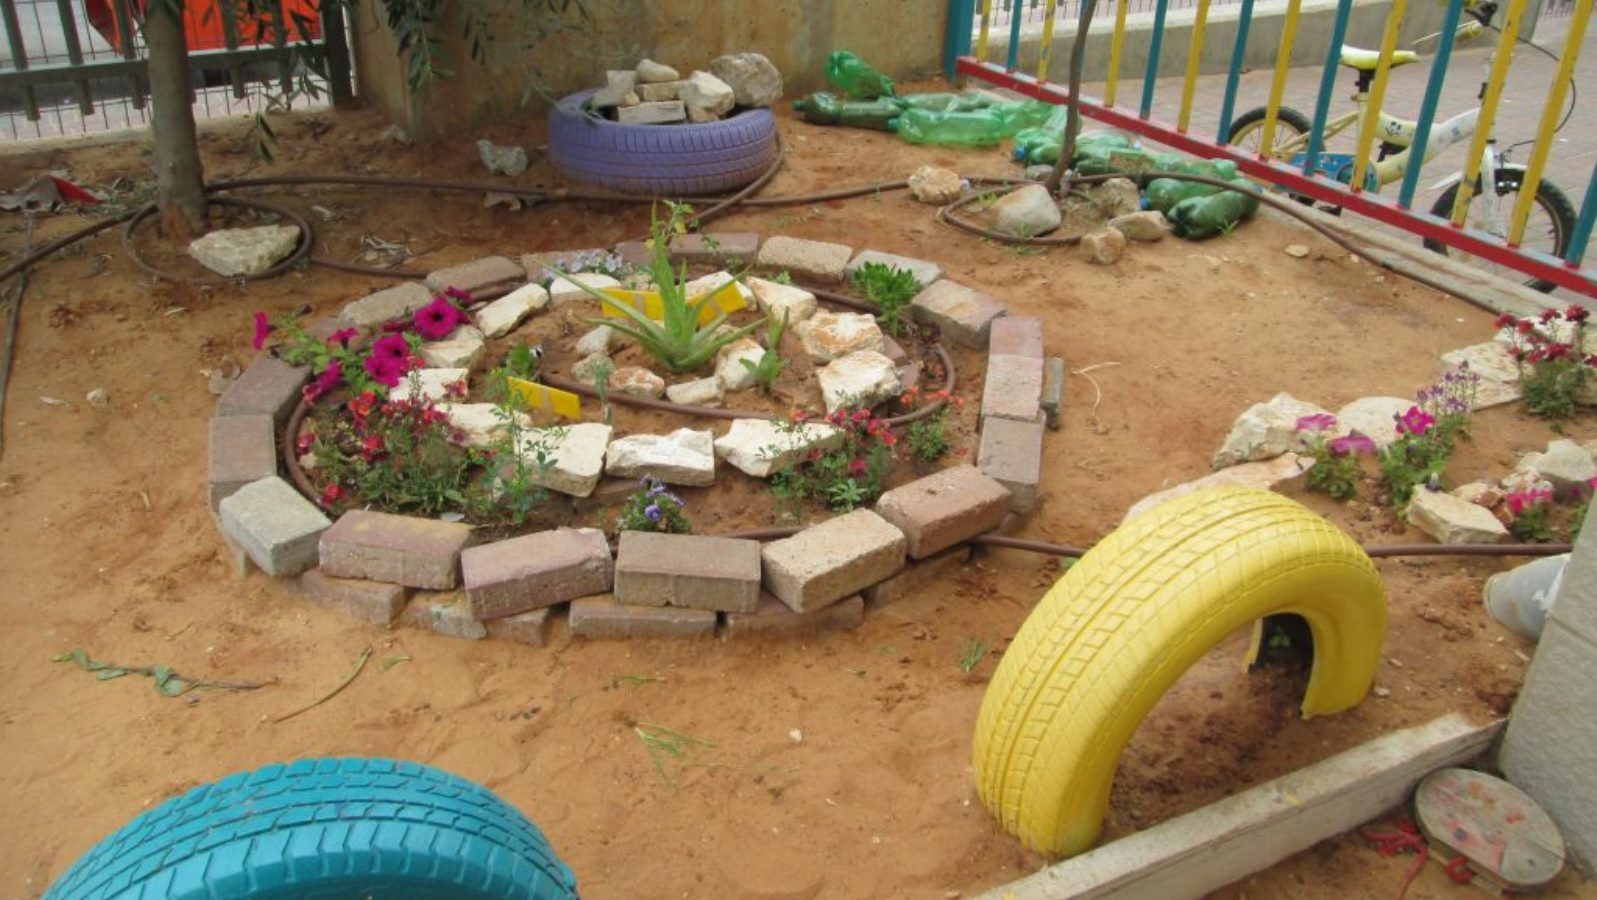 A preschool garden in Modi'in Illit. Photo: courtesy